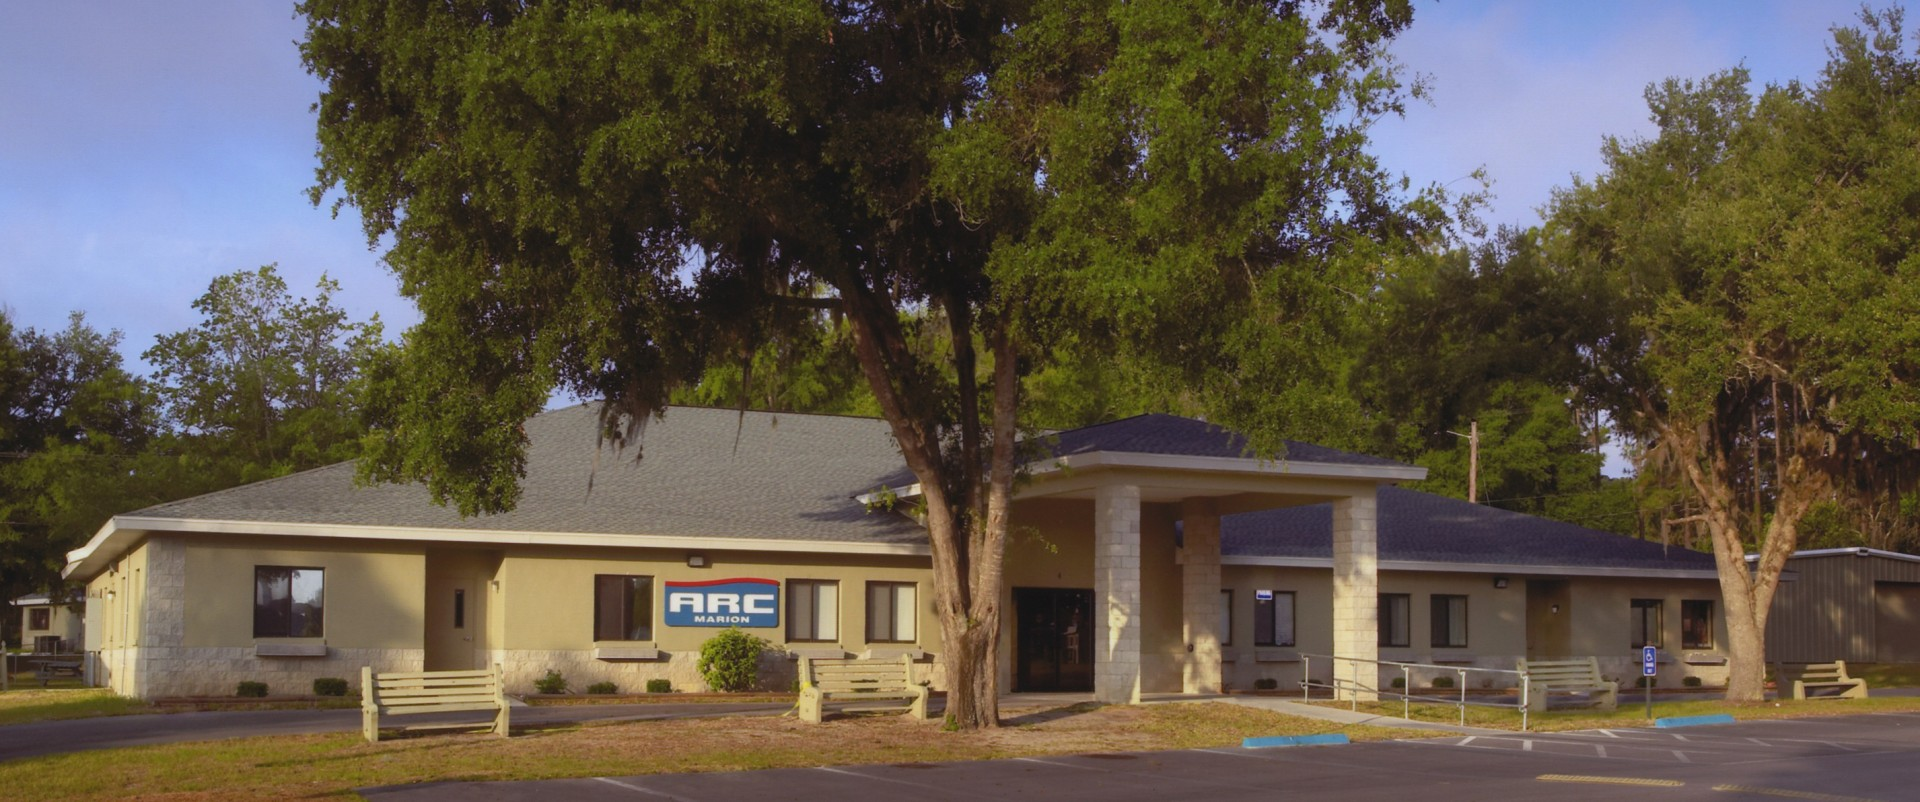 ARC BUILDINGS 1